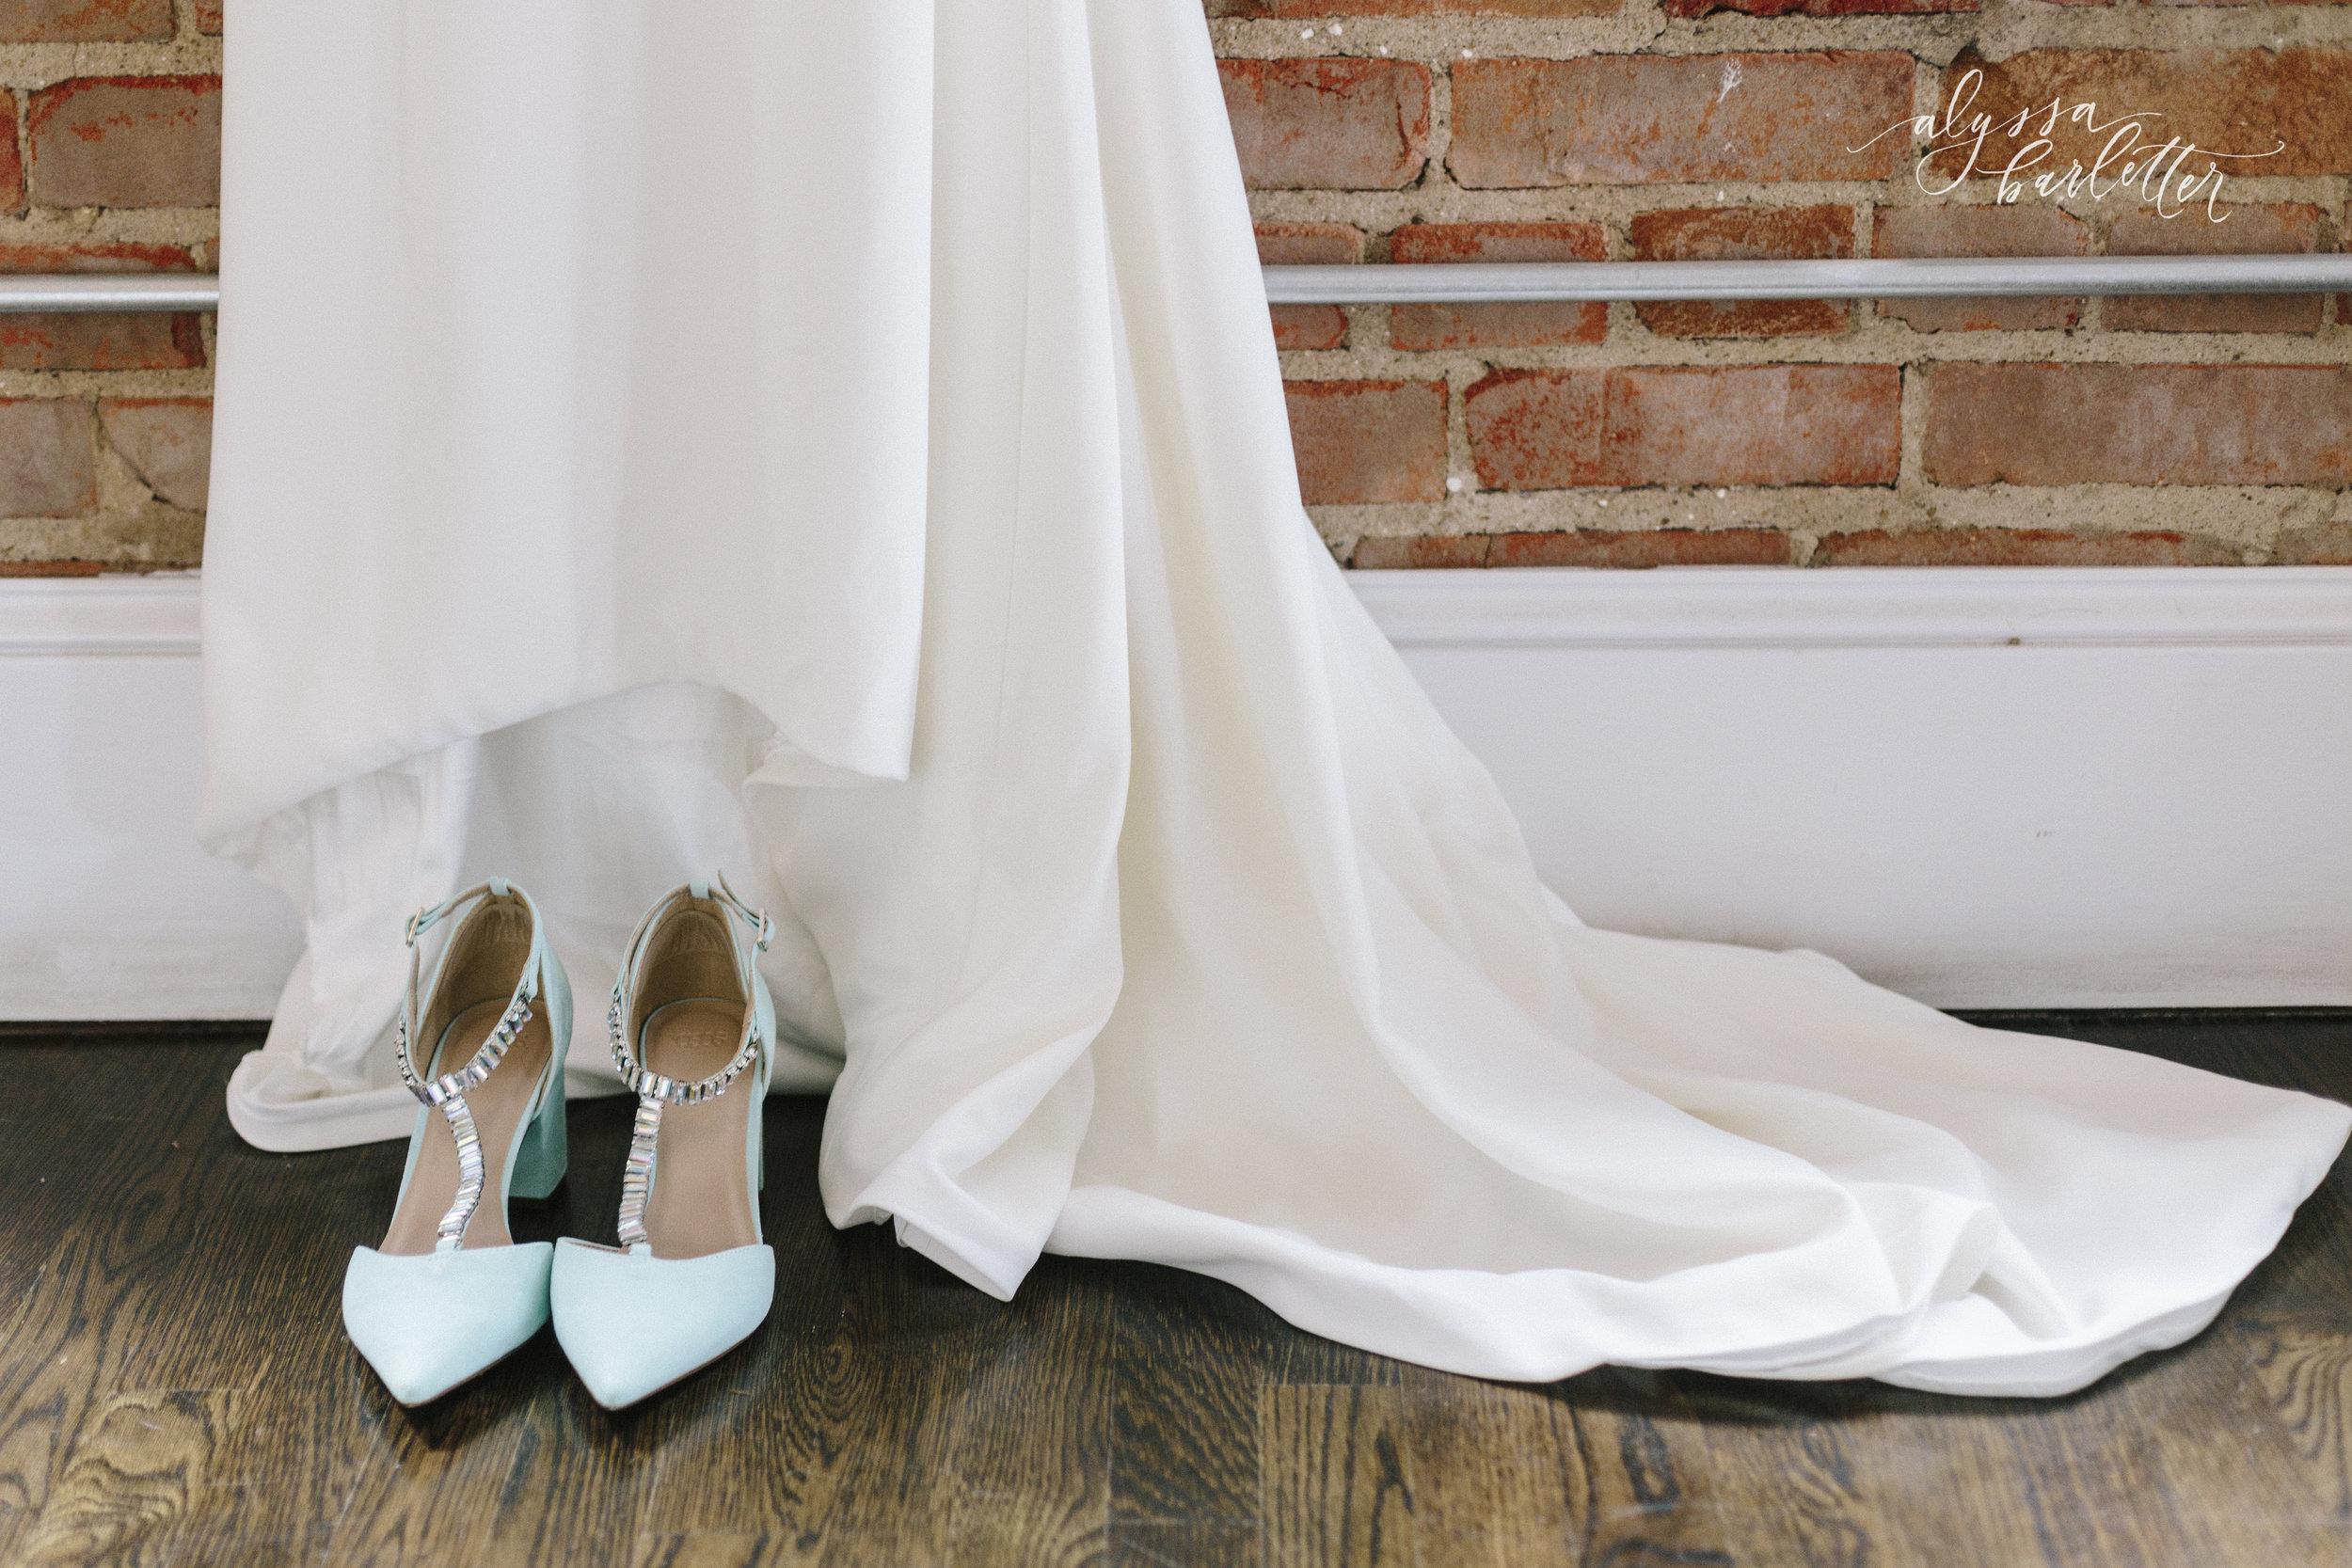 alyssa barletter photography kansas city wedding 2016 main courtney and brian-1-2.jpg